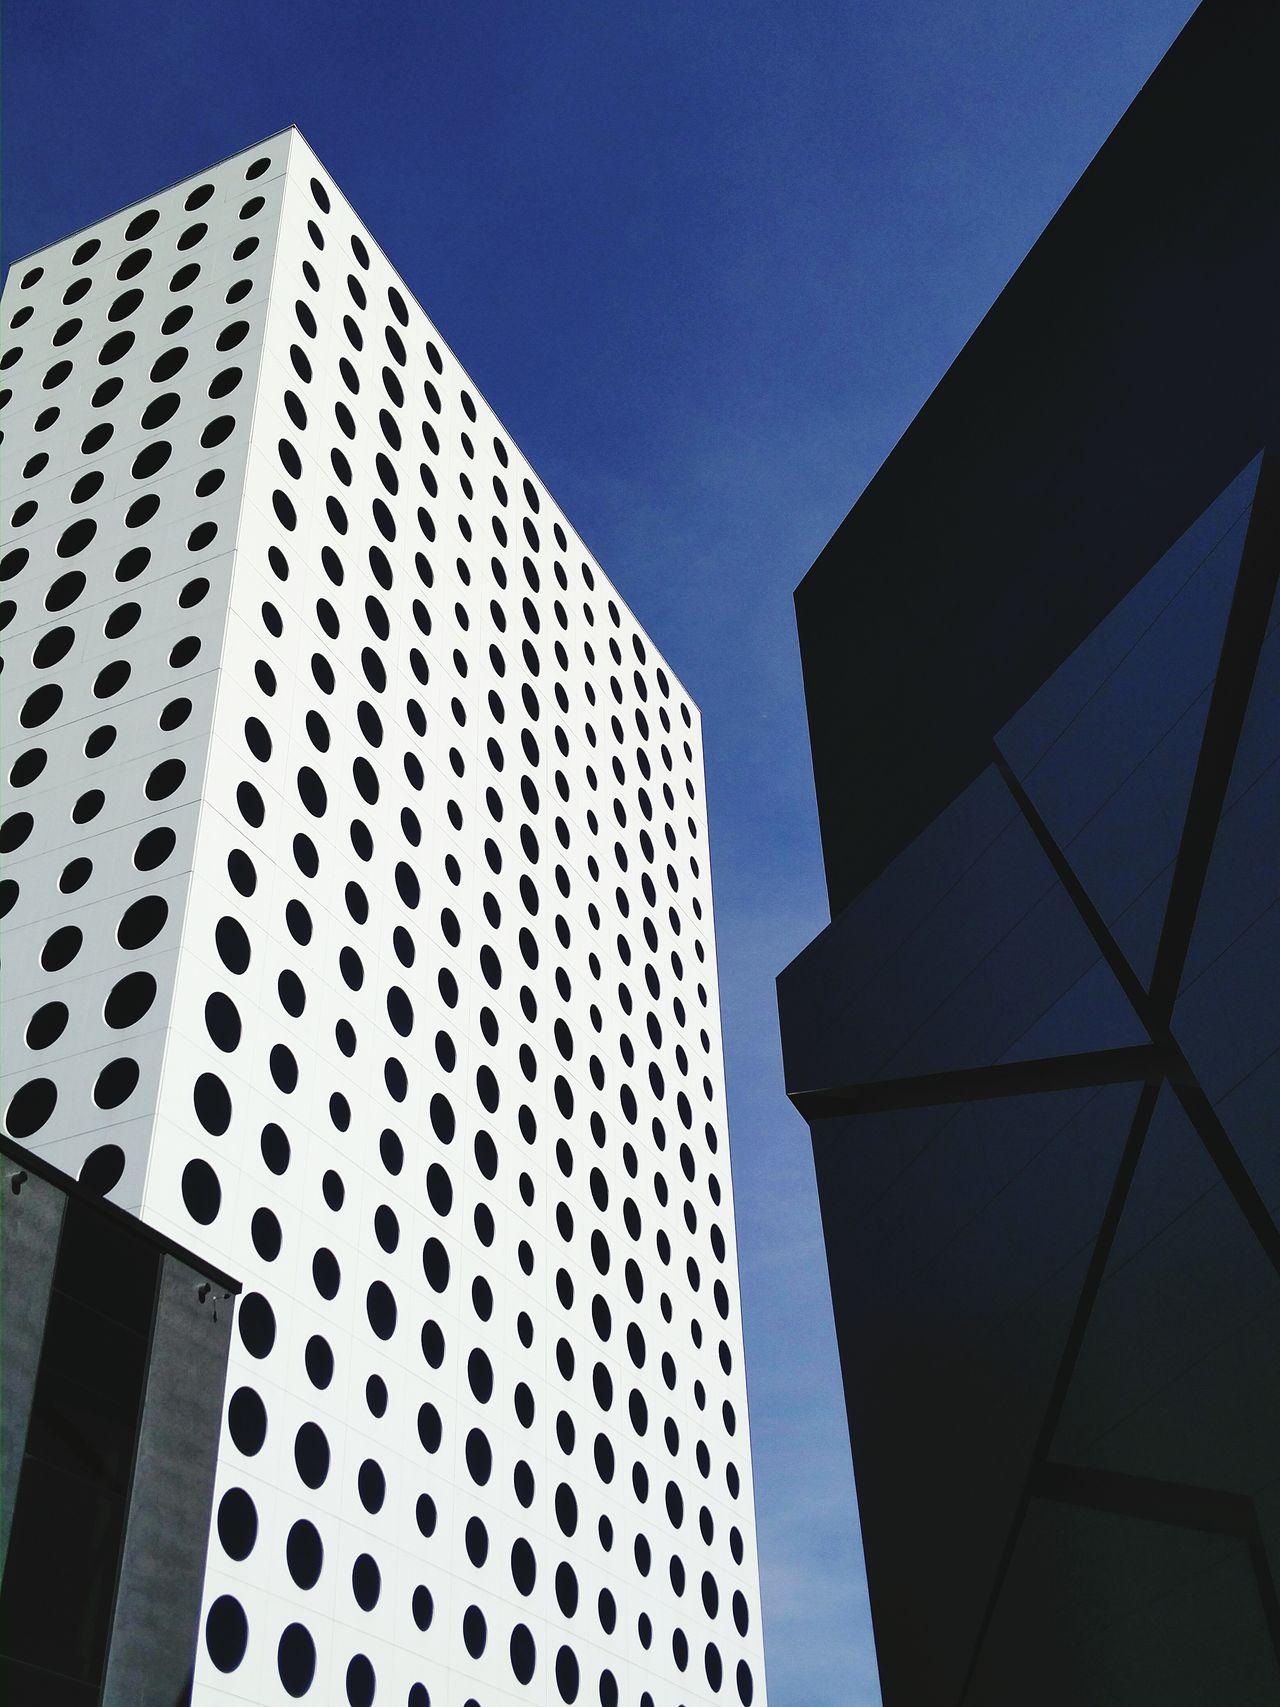 Architecture of Solna Architecture The Architect - 2016 EyeEm Awards Solna Sweden Window Windows Round Round And Round Square And Round Fine Art Photography Minimalist Architecture